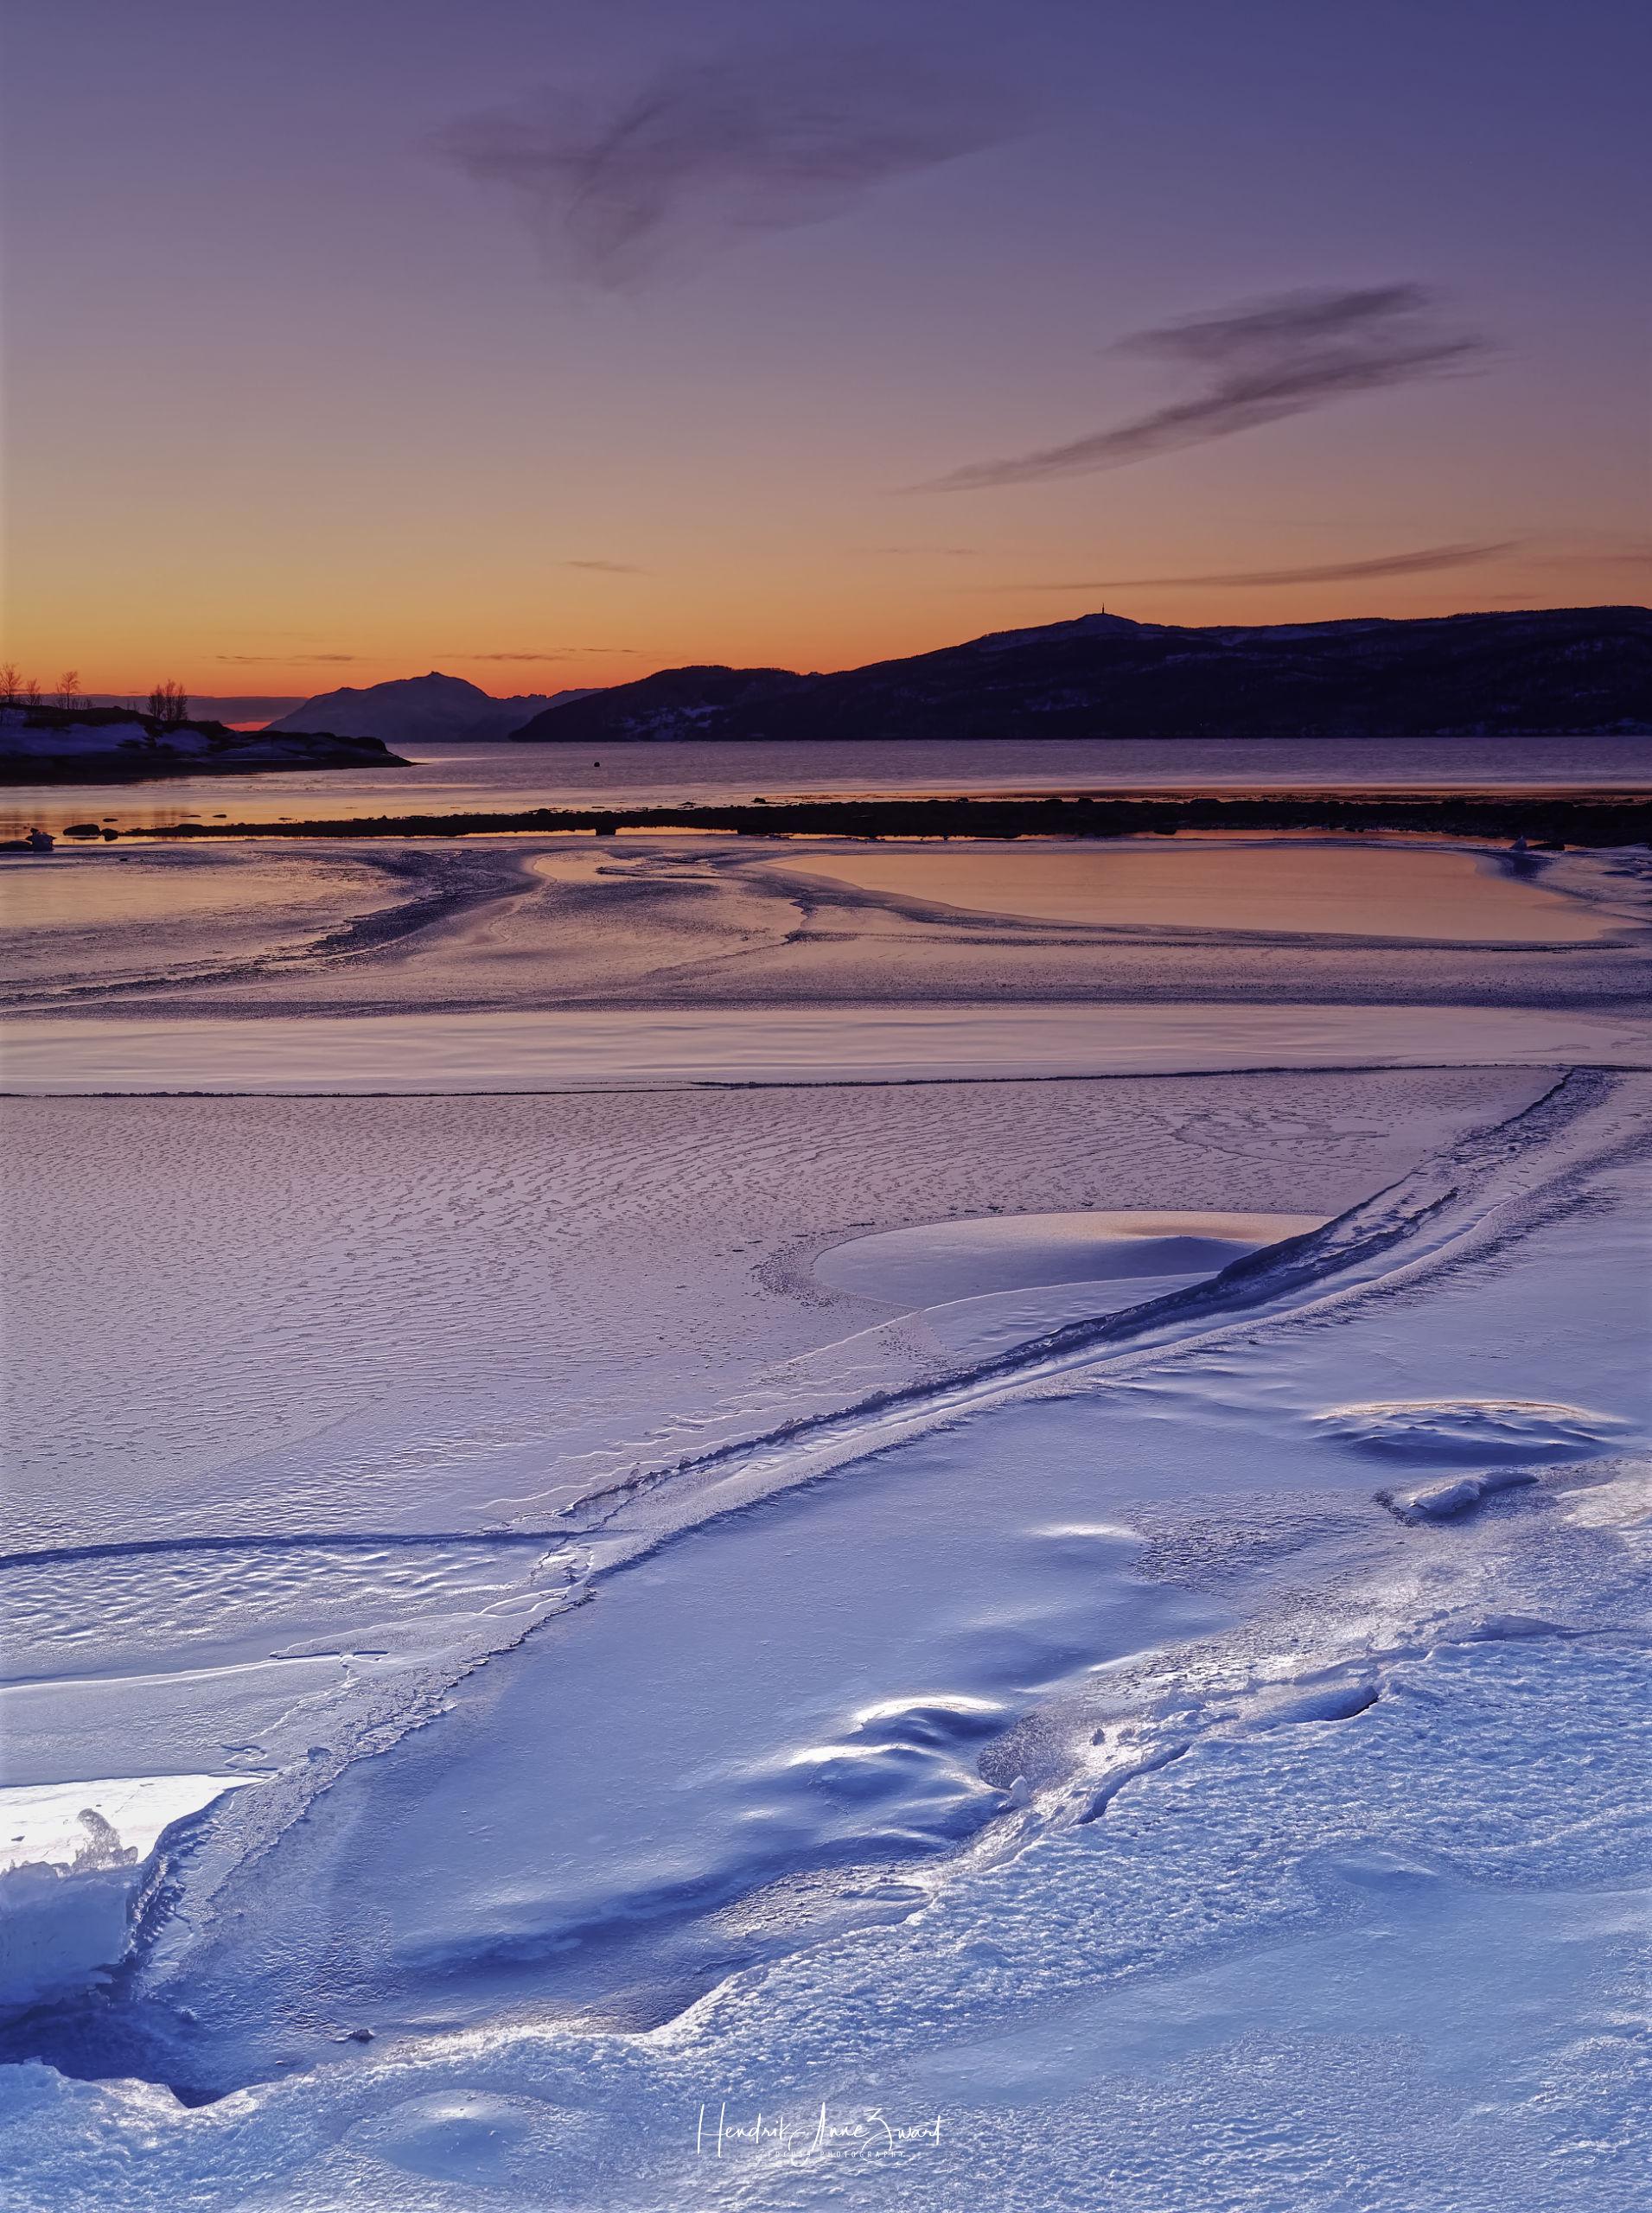 Tømmervik_Ice_Sunset_Norway_1.jpg